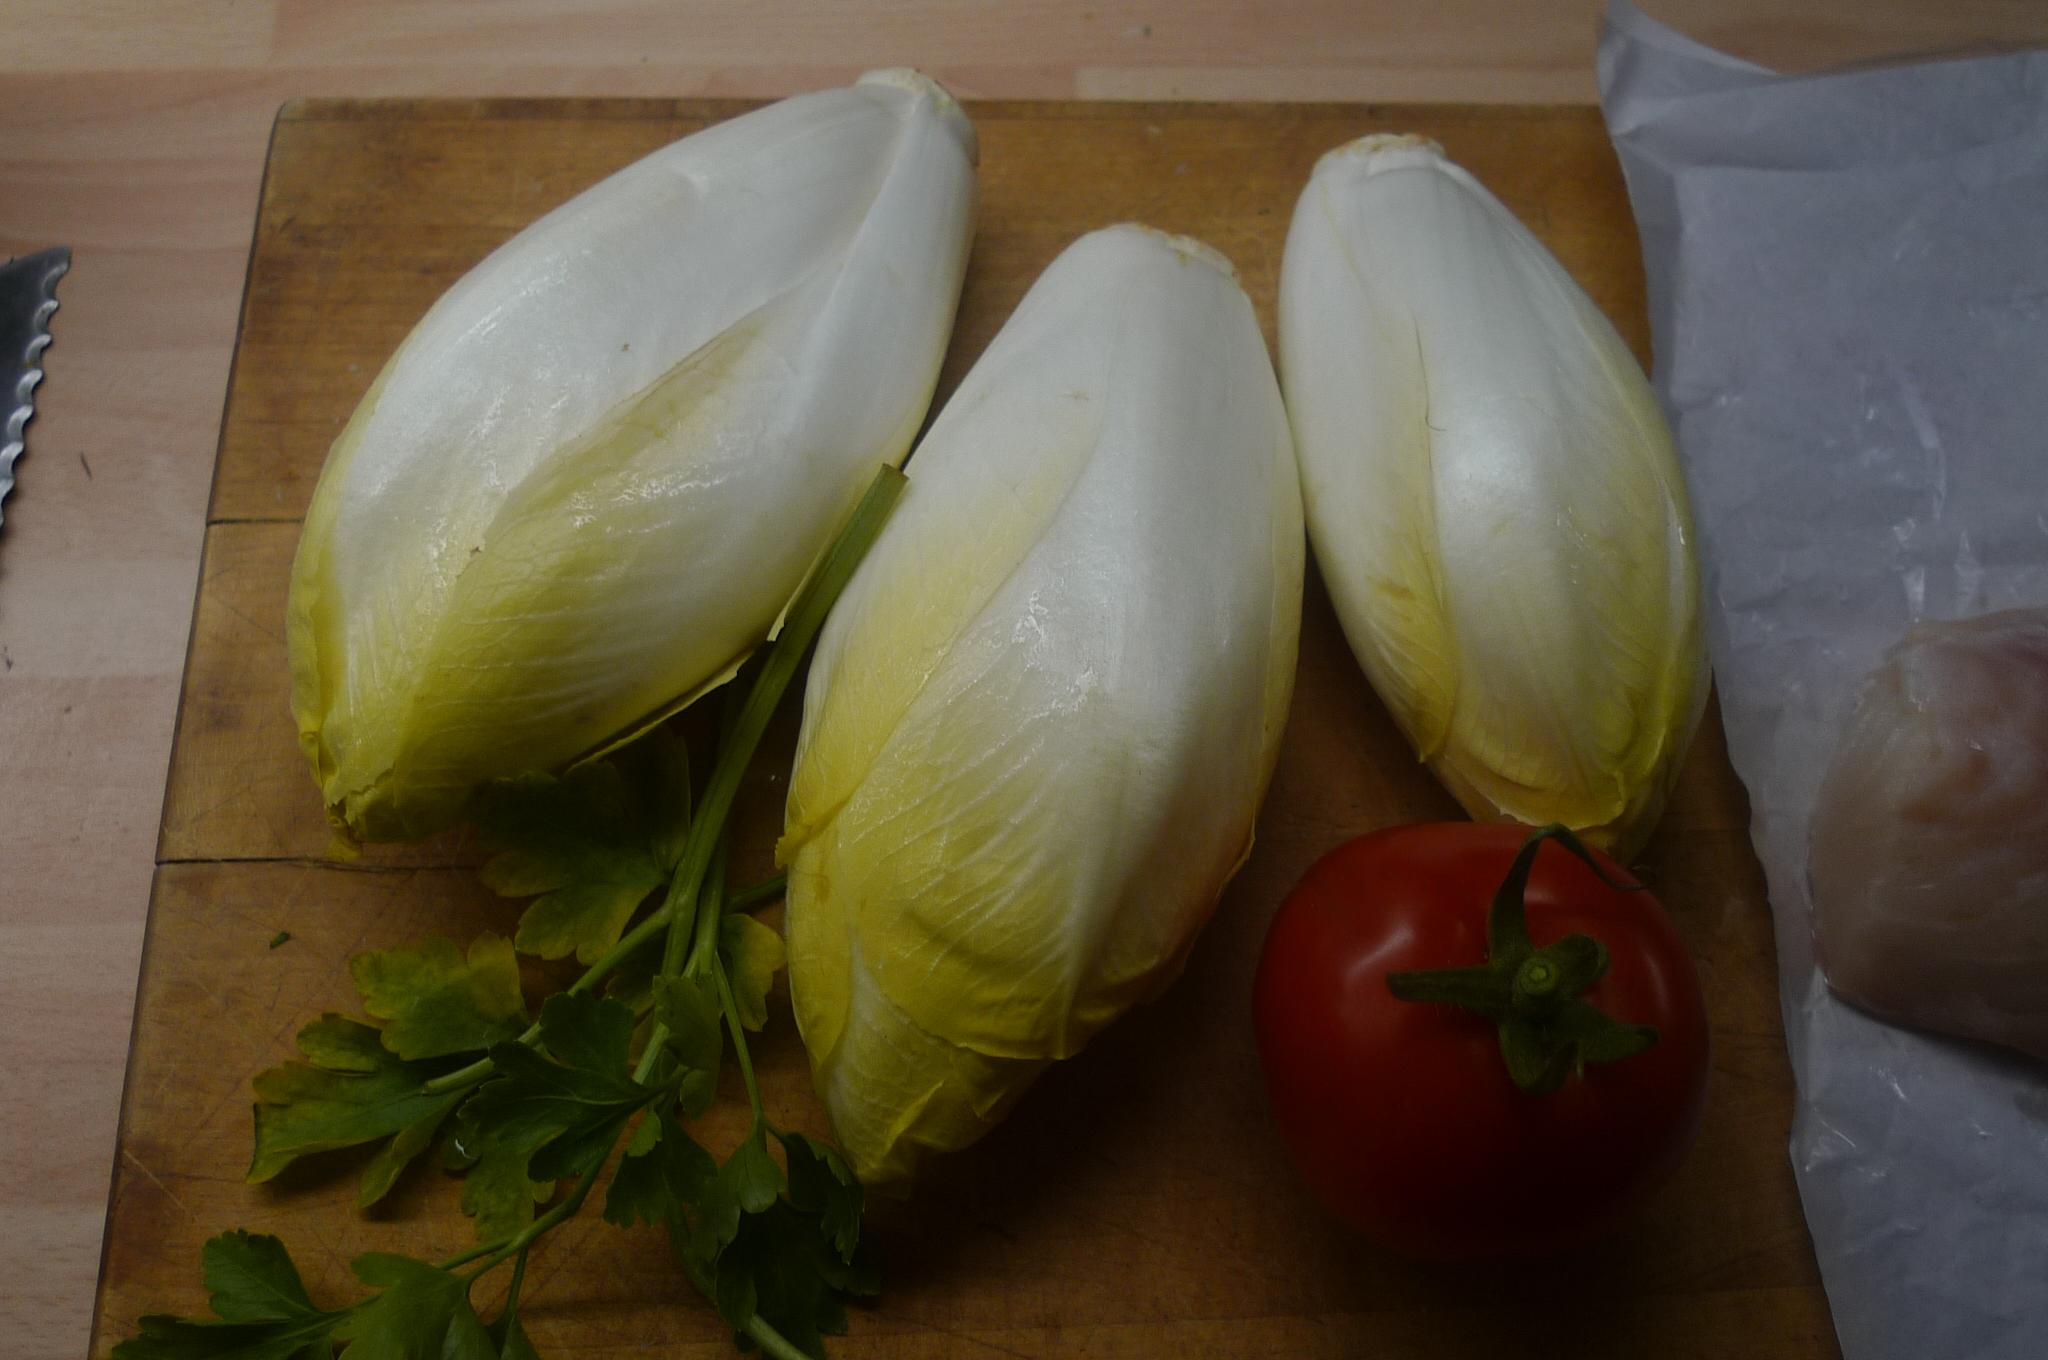 Kabeljau,Chicoreesalat,Kartoffeln,Quarkspeise - 17.2.15   (2)